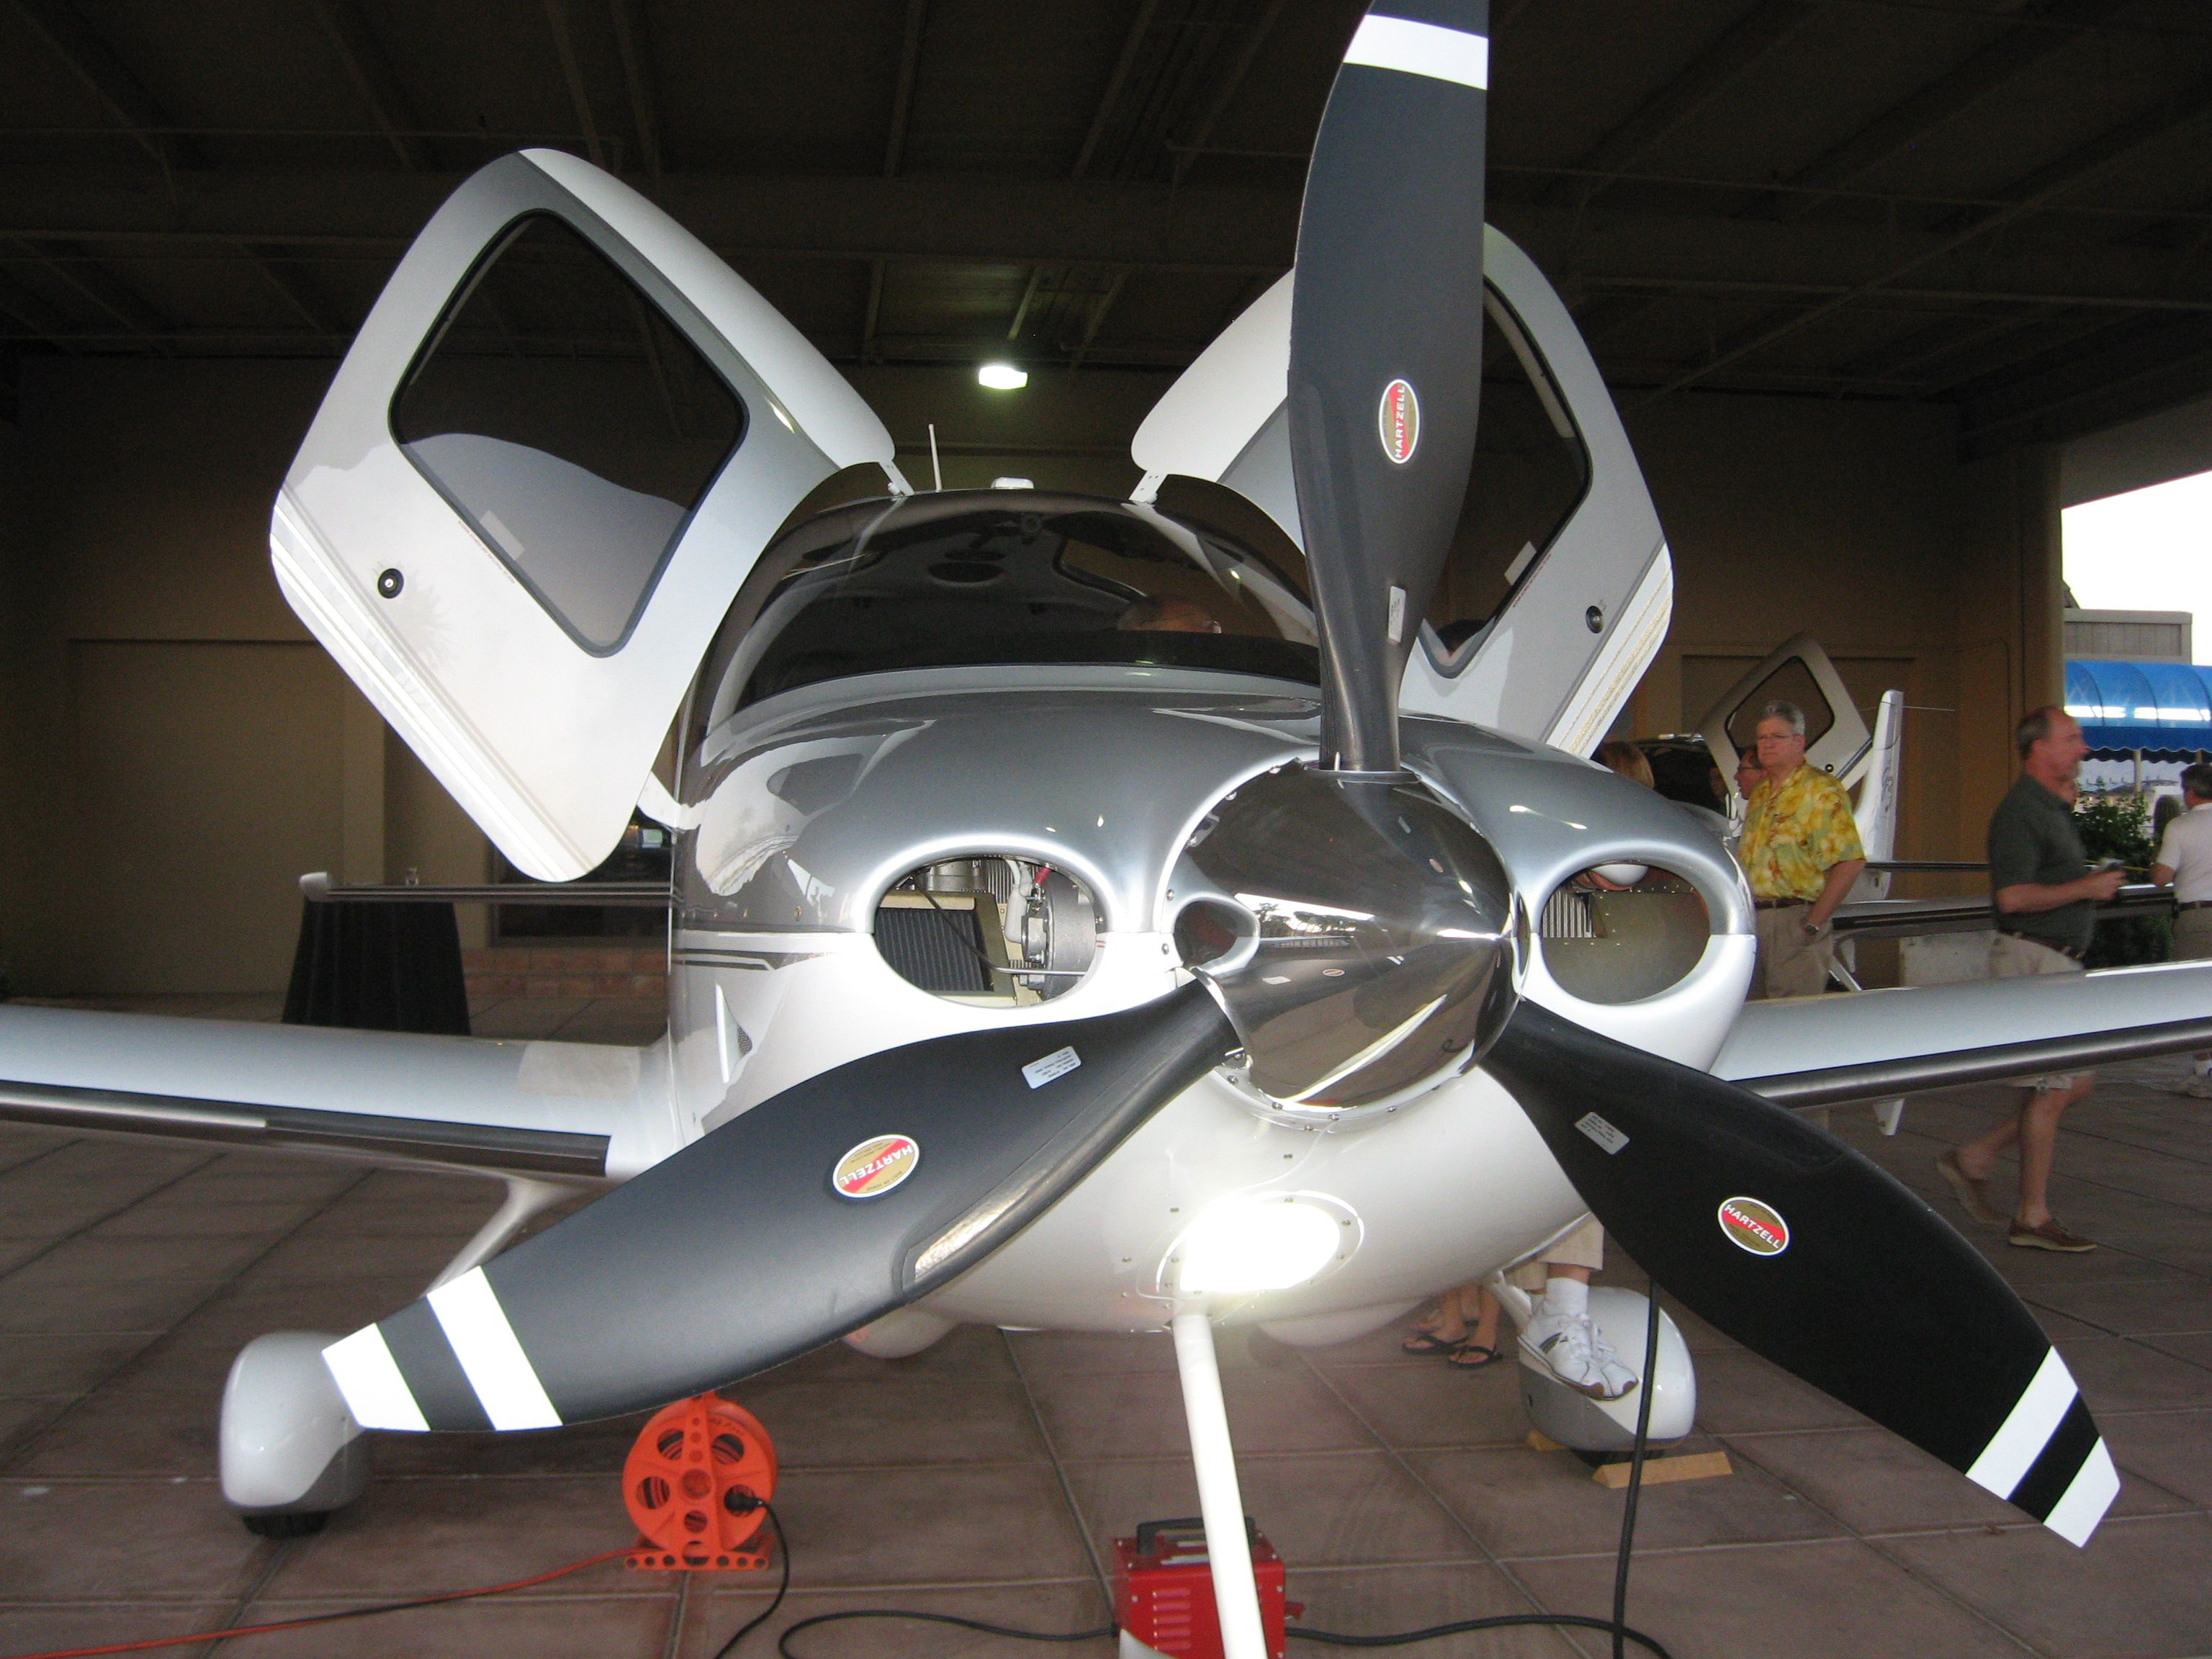 Cirrus Sr 22 With 3 Blade Propeller